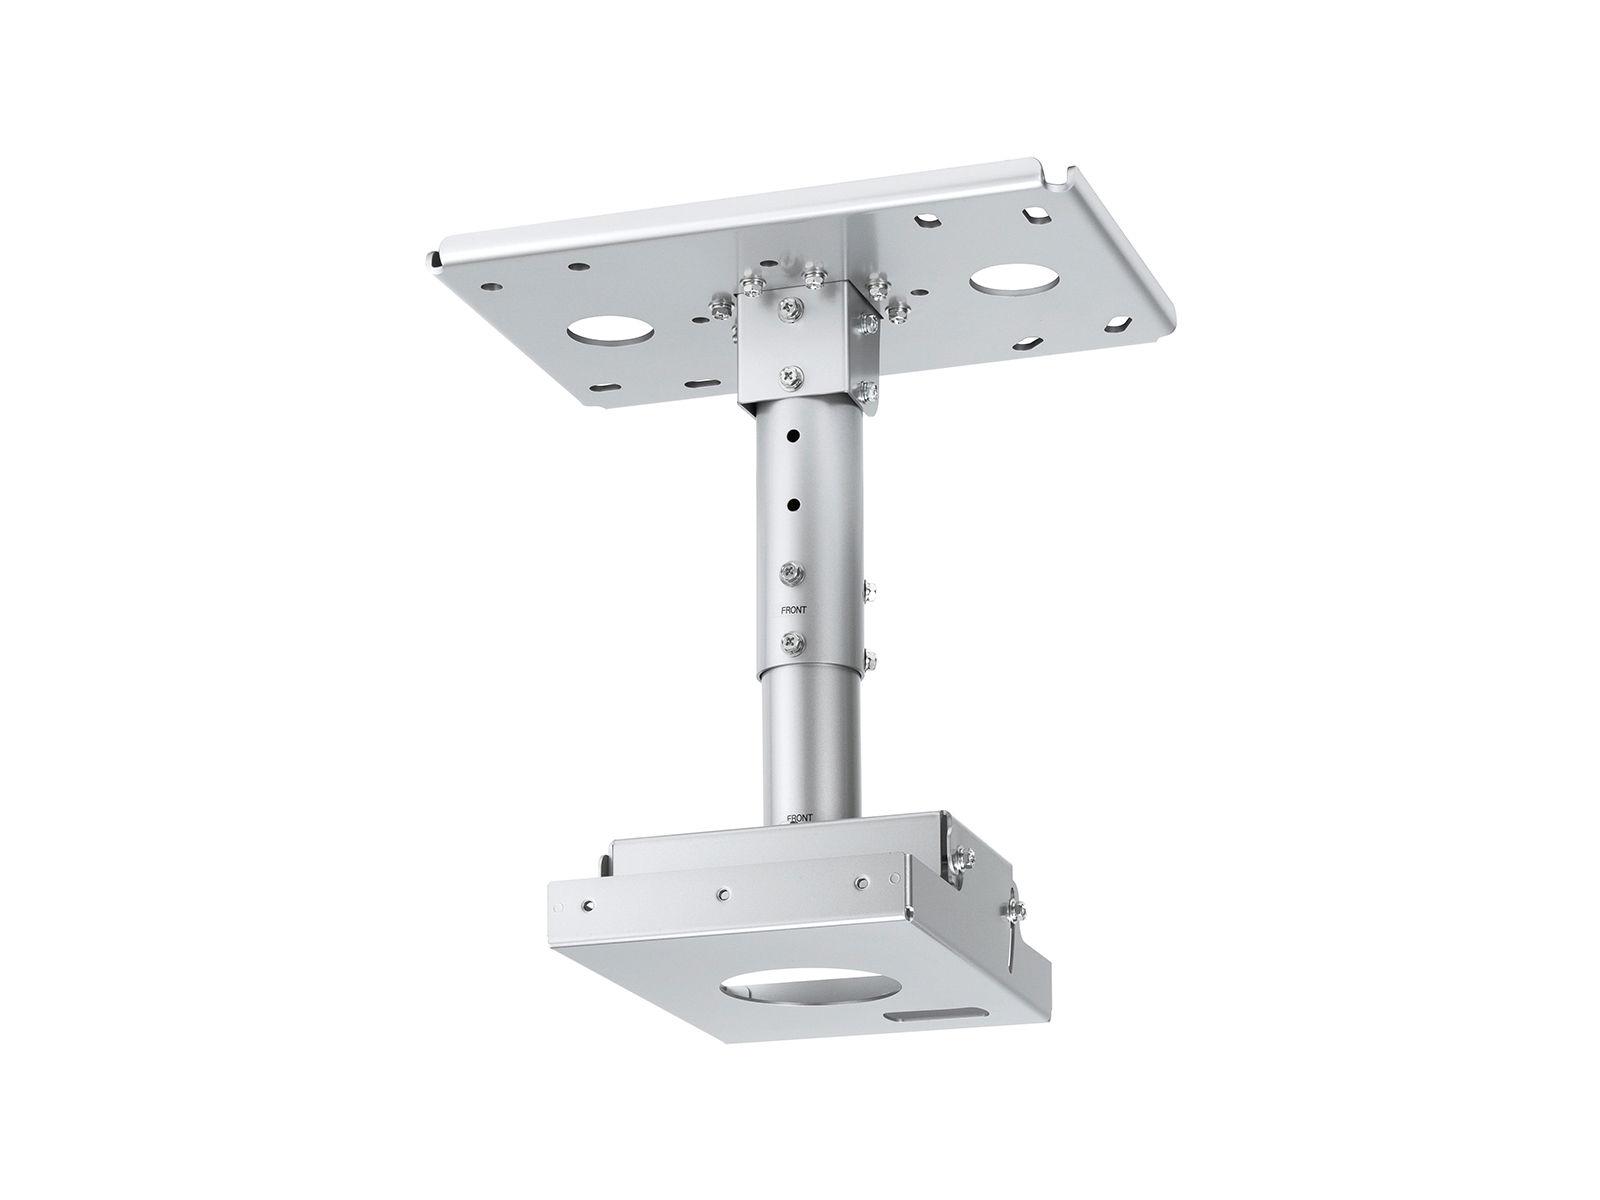 Panasonic ET-PKD120H | Deckenhalterung, lang,  PT-DX100/DW830/DZ870/, D4000/D5000/D5500/D5600/D5700/DW5000/DW5100/